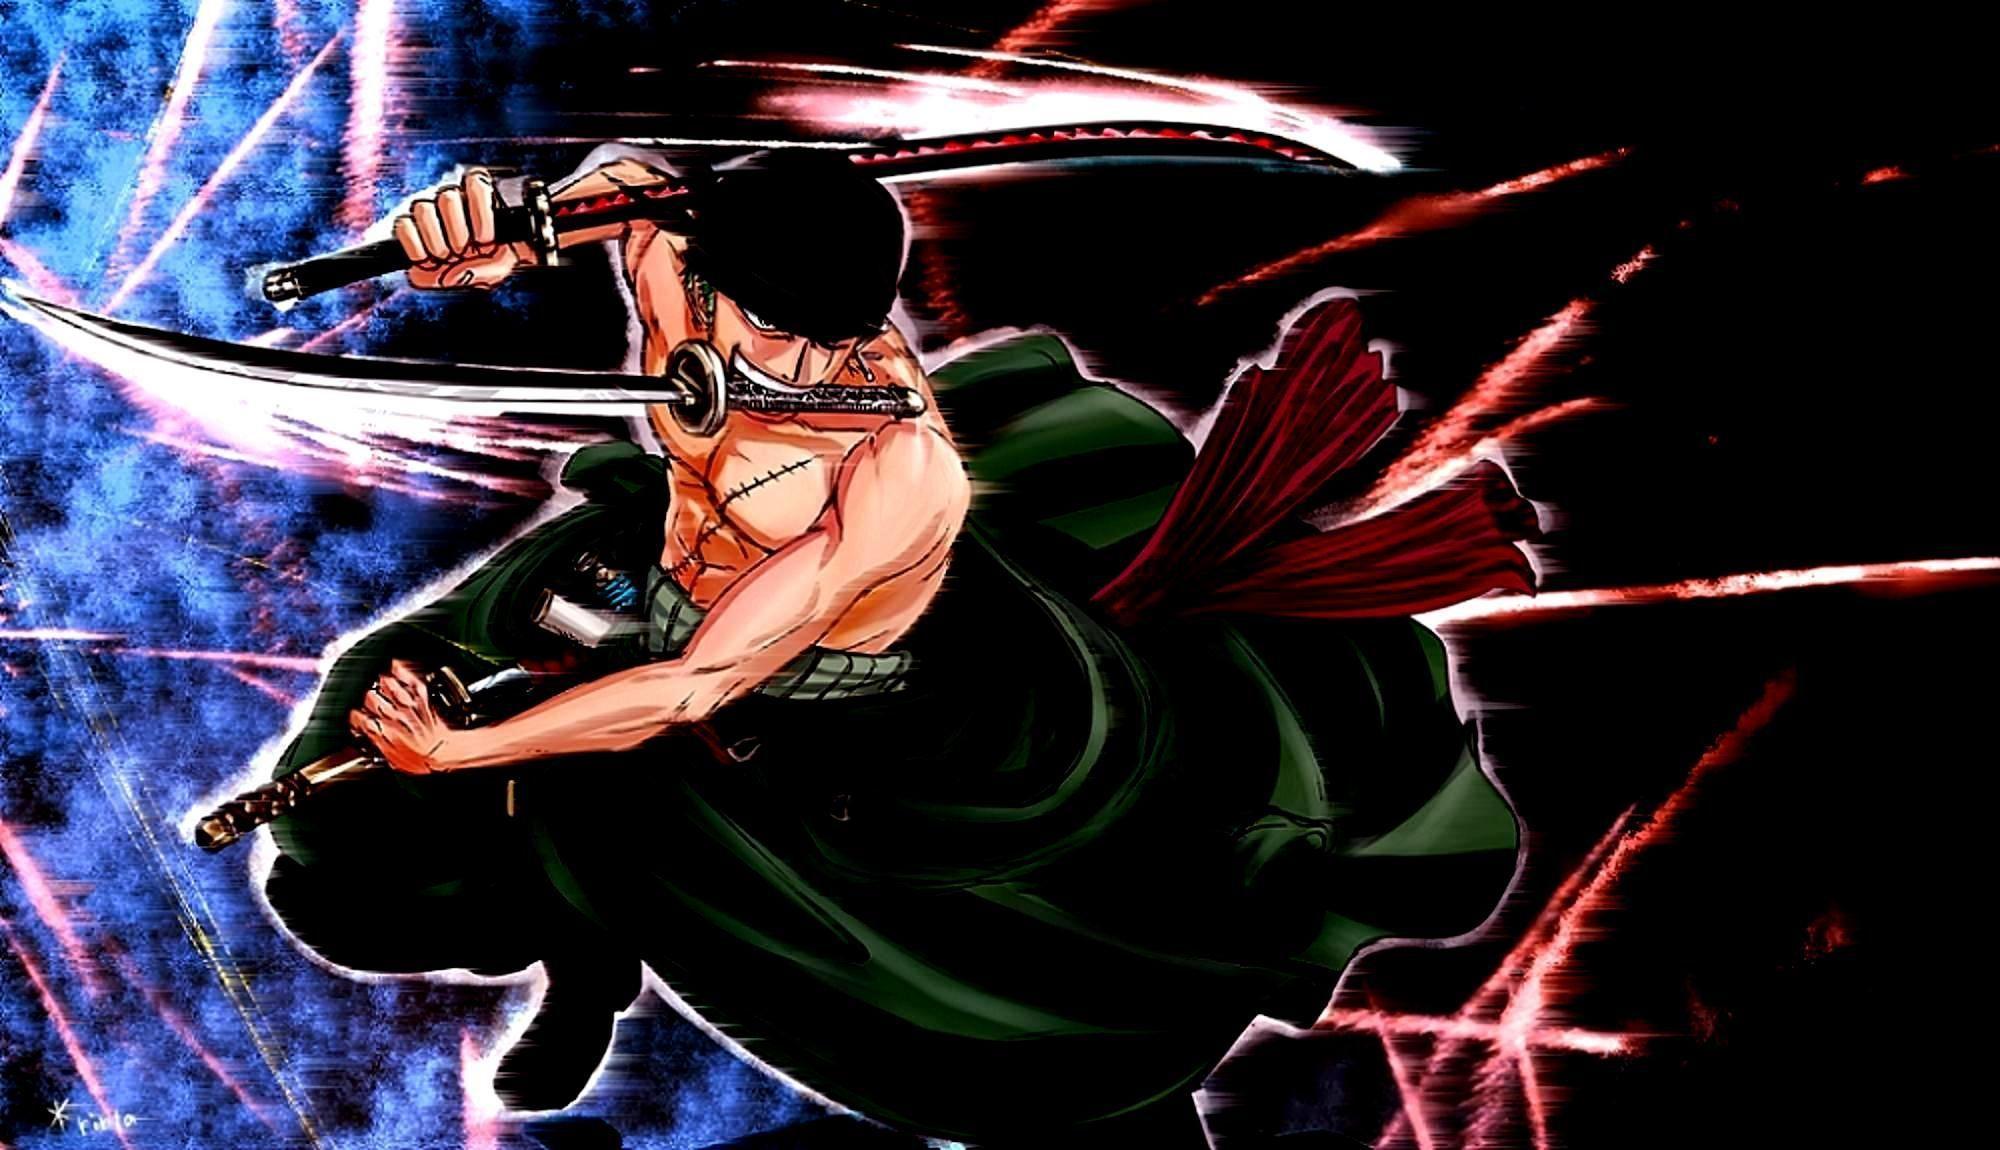 Haki One Piece Zoro Wallpapers Top Free Haki One Piece